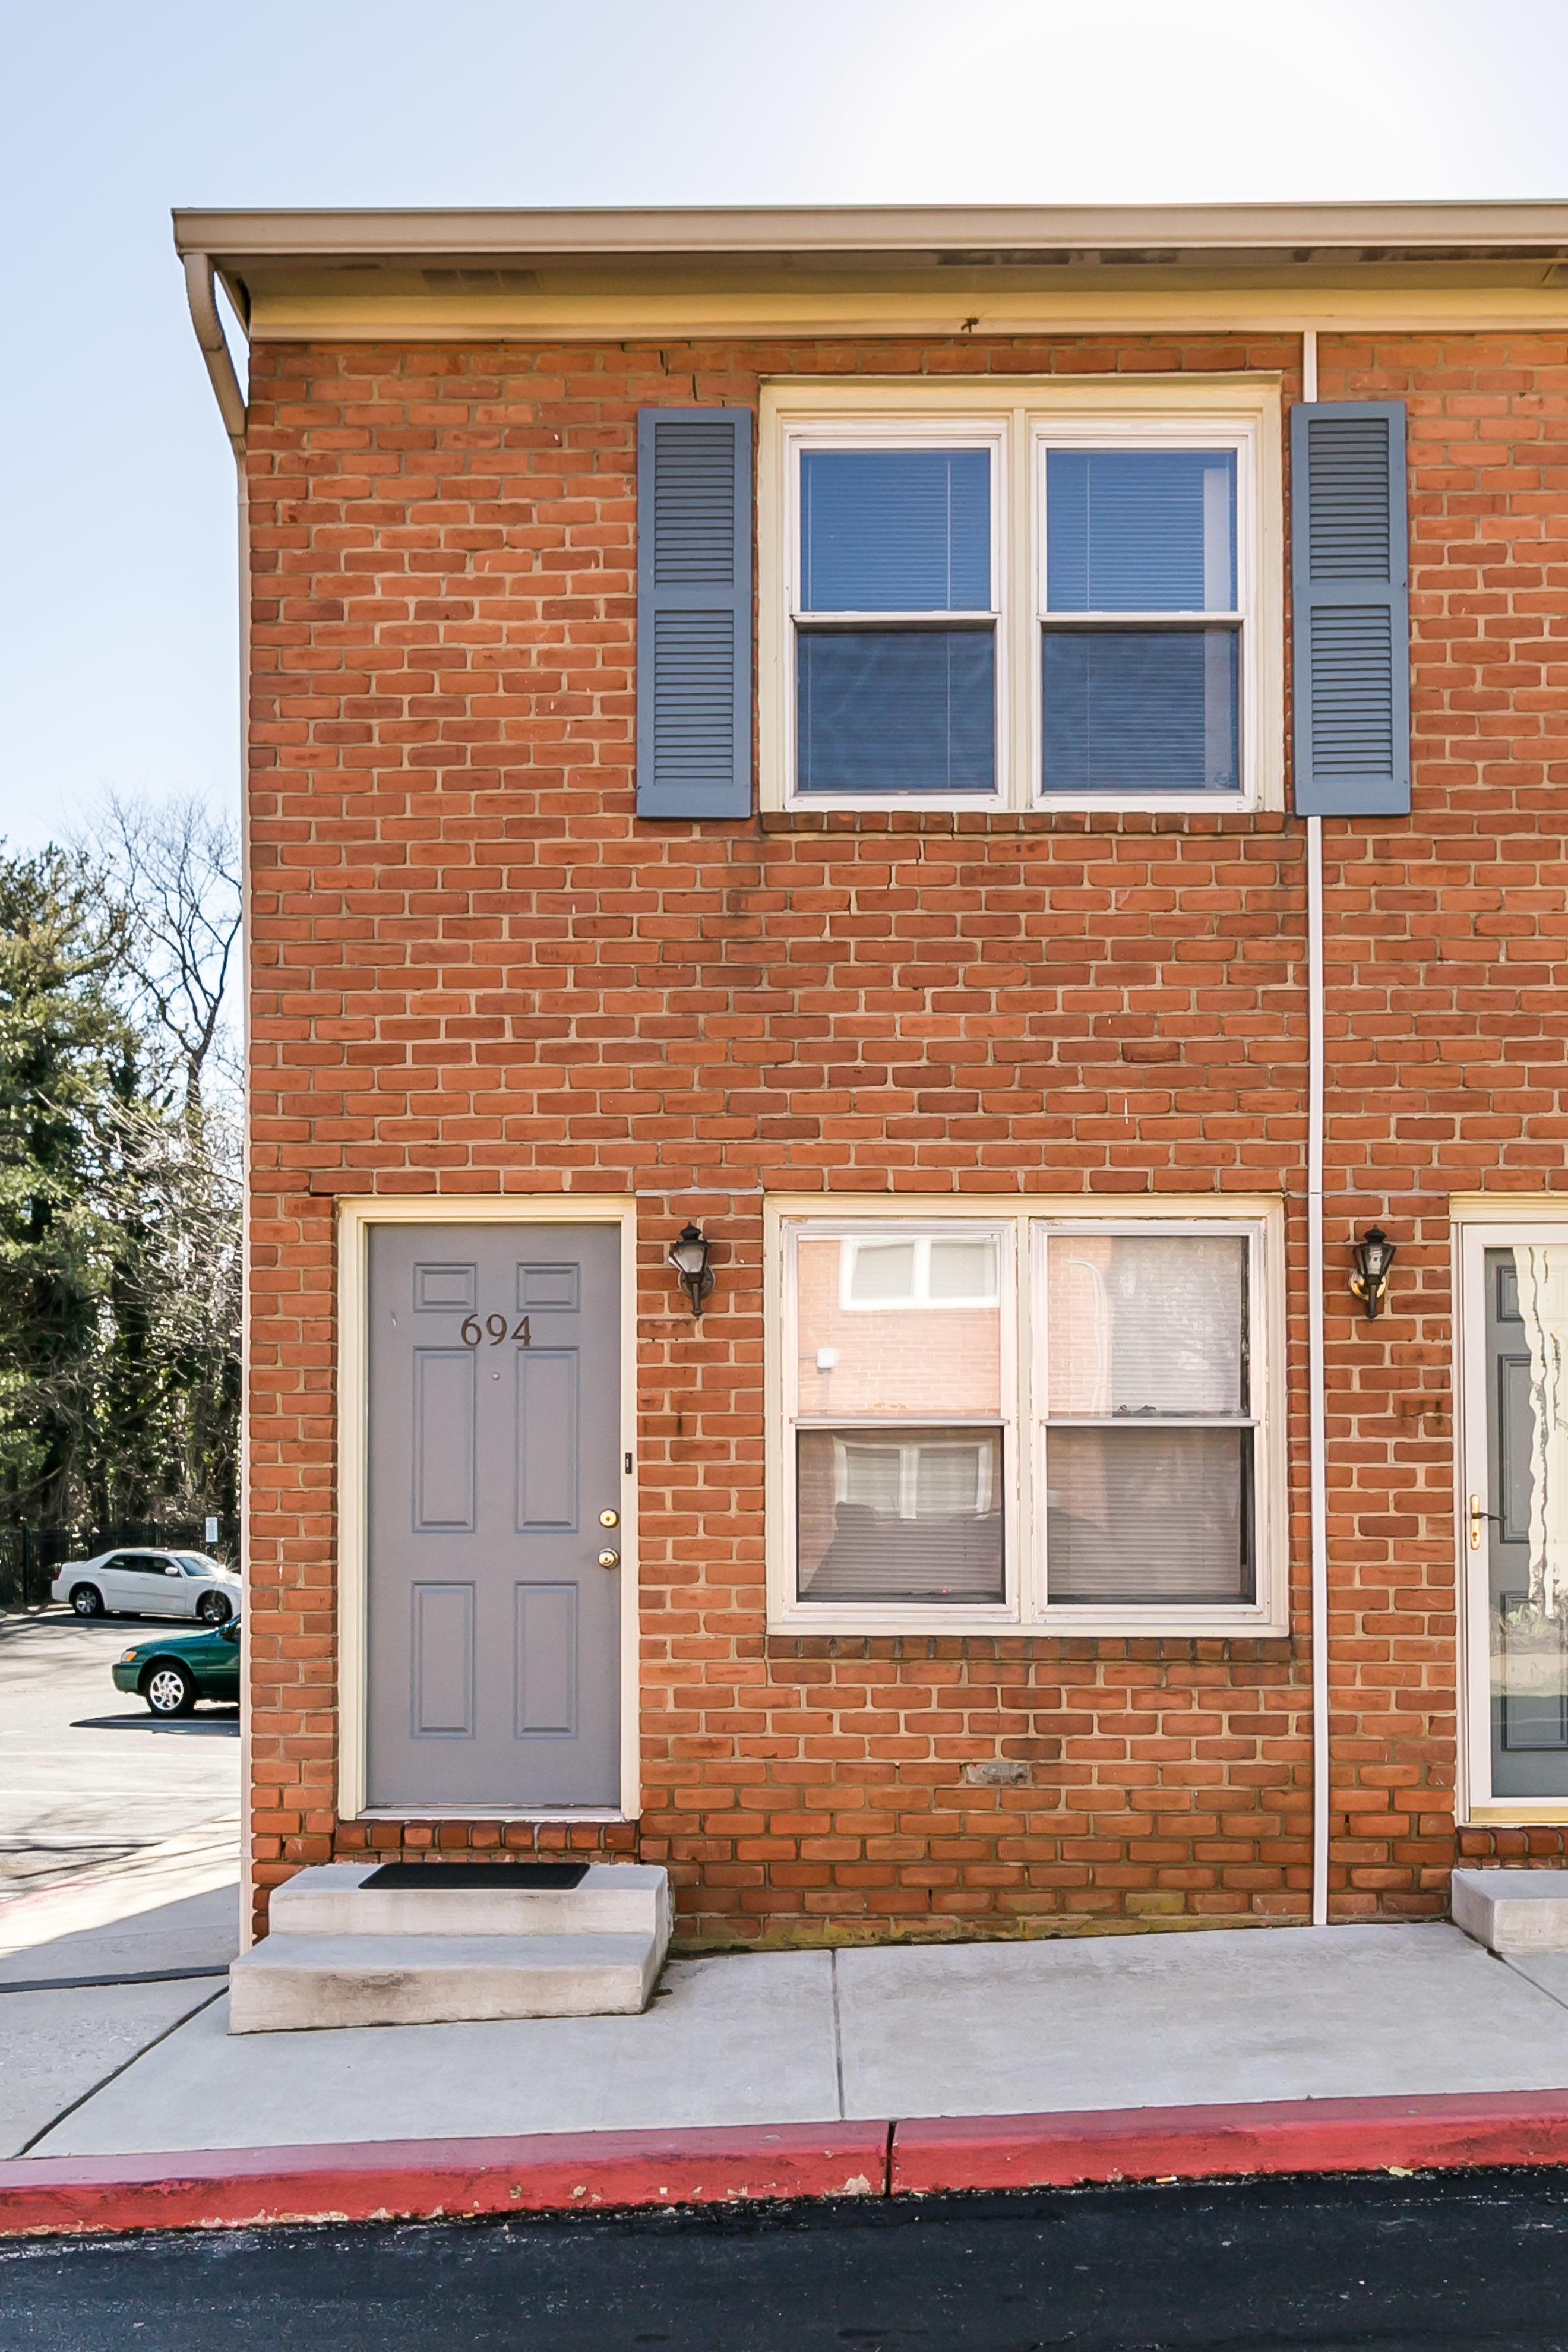 Nhà tập thể vì Bán tại Dutch Glen Condominium 694 Rosedale street #63 Annapolis, Maryland, 21401 Hoa Kỳ